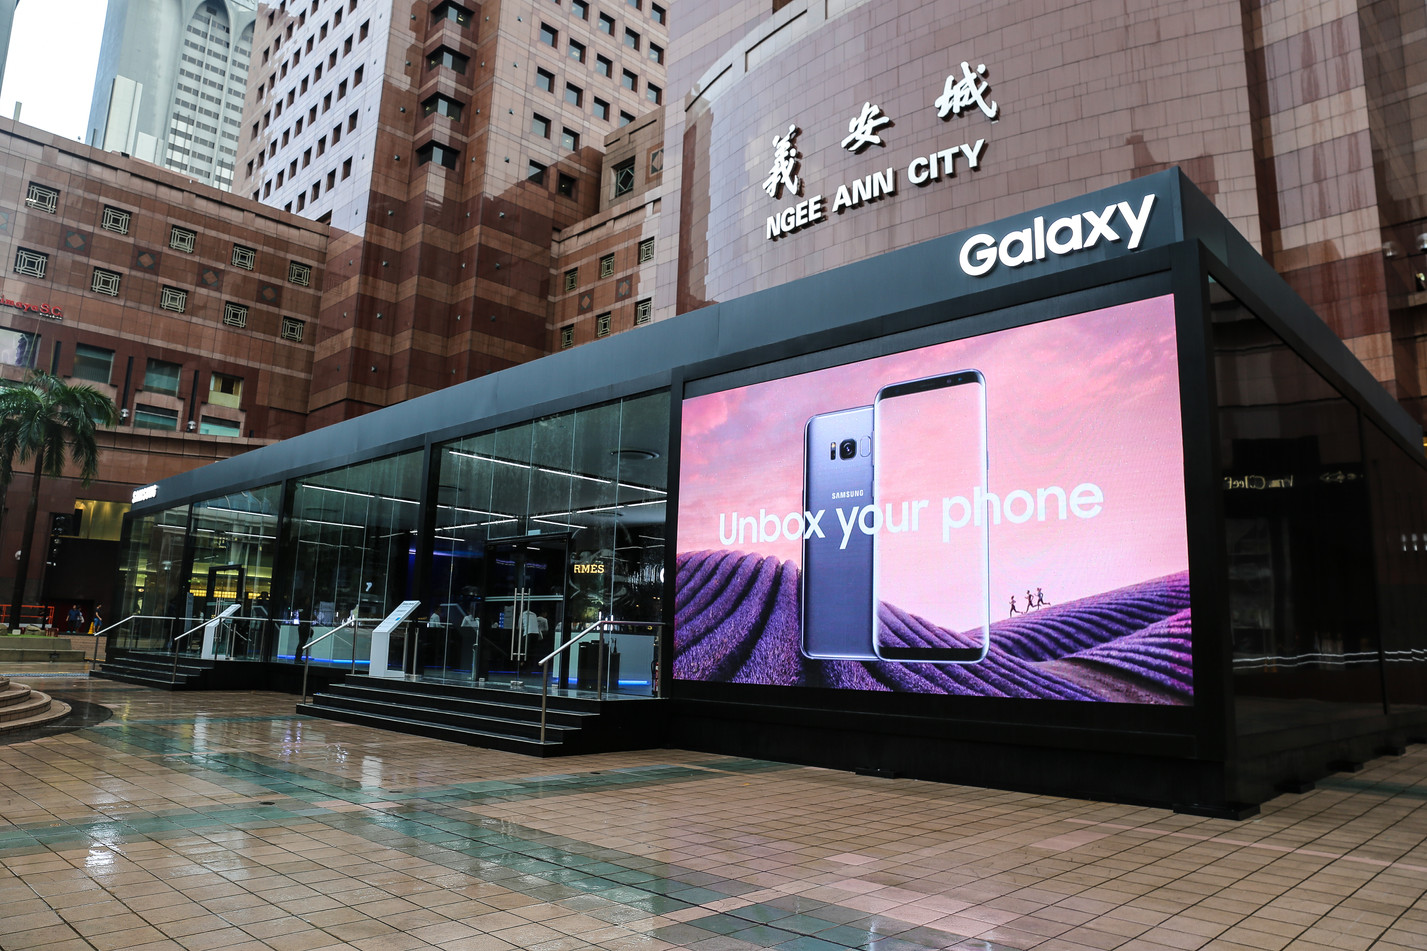 Samsung Galaxy Launch Showroom@NGEE ANN CITY